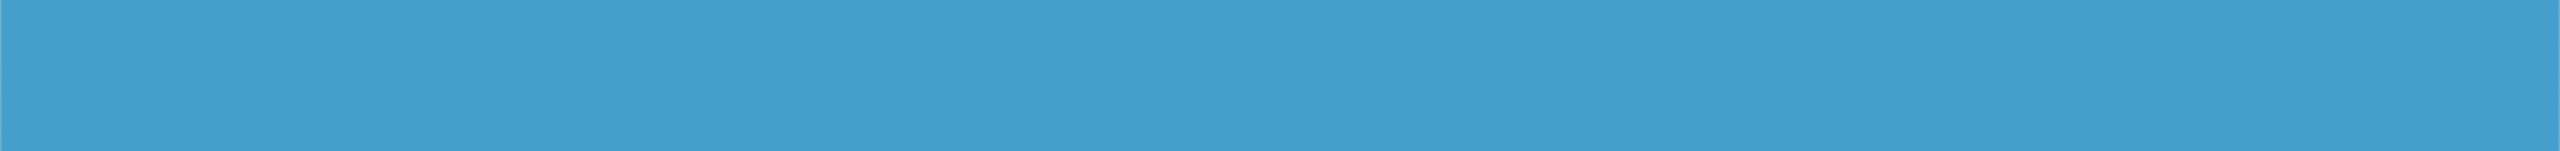 bildschirmfoto-2019-12-03-um-17.35.33-scaled